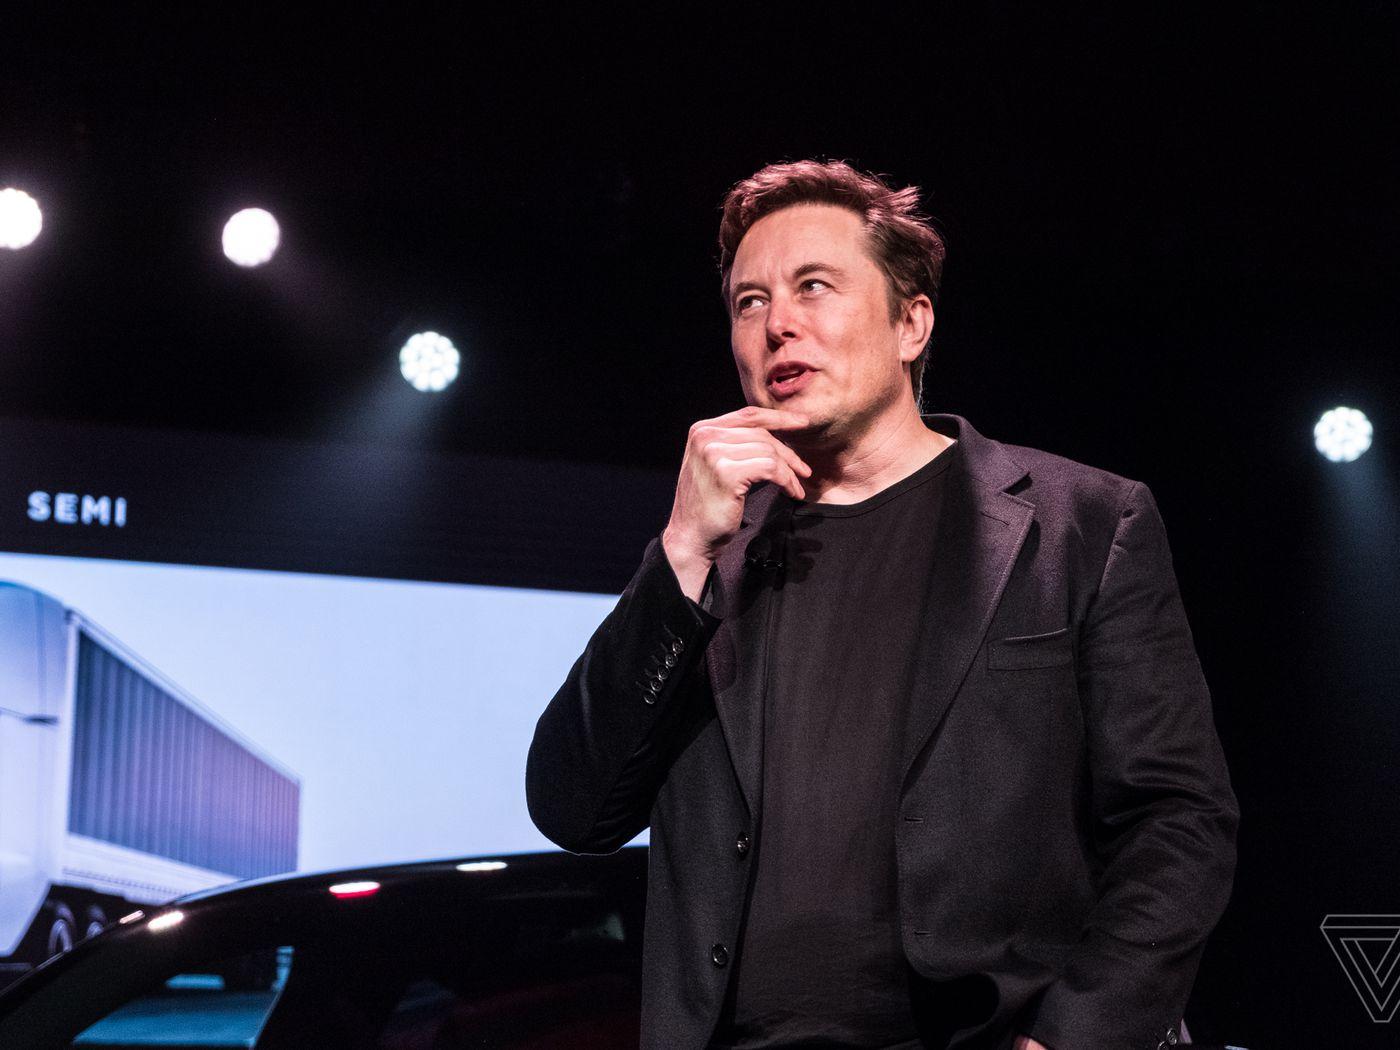 Elon Musk Says Tesla Has A Good Chance Of Record